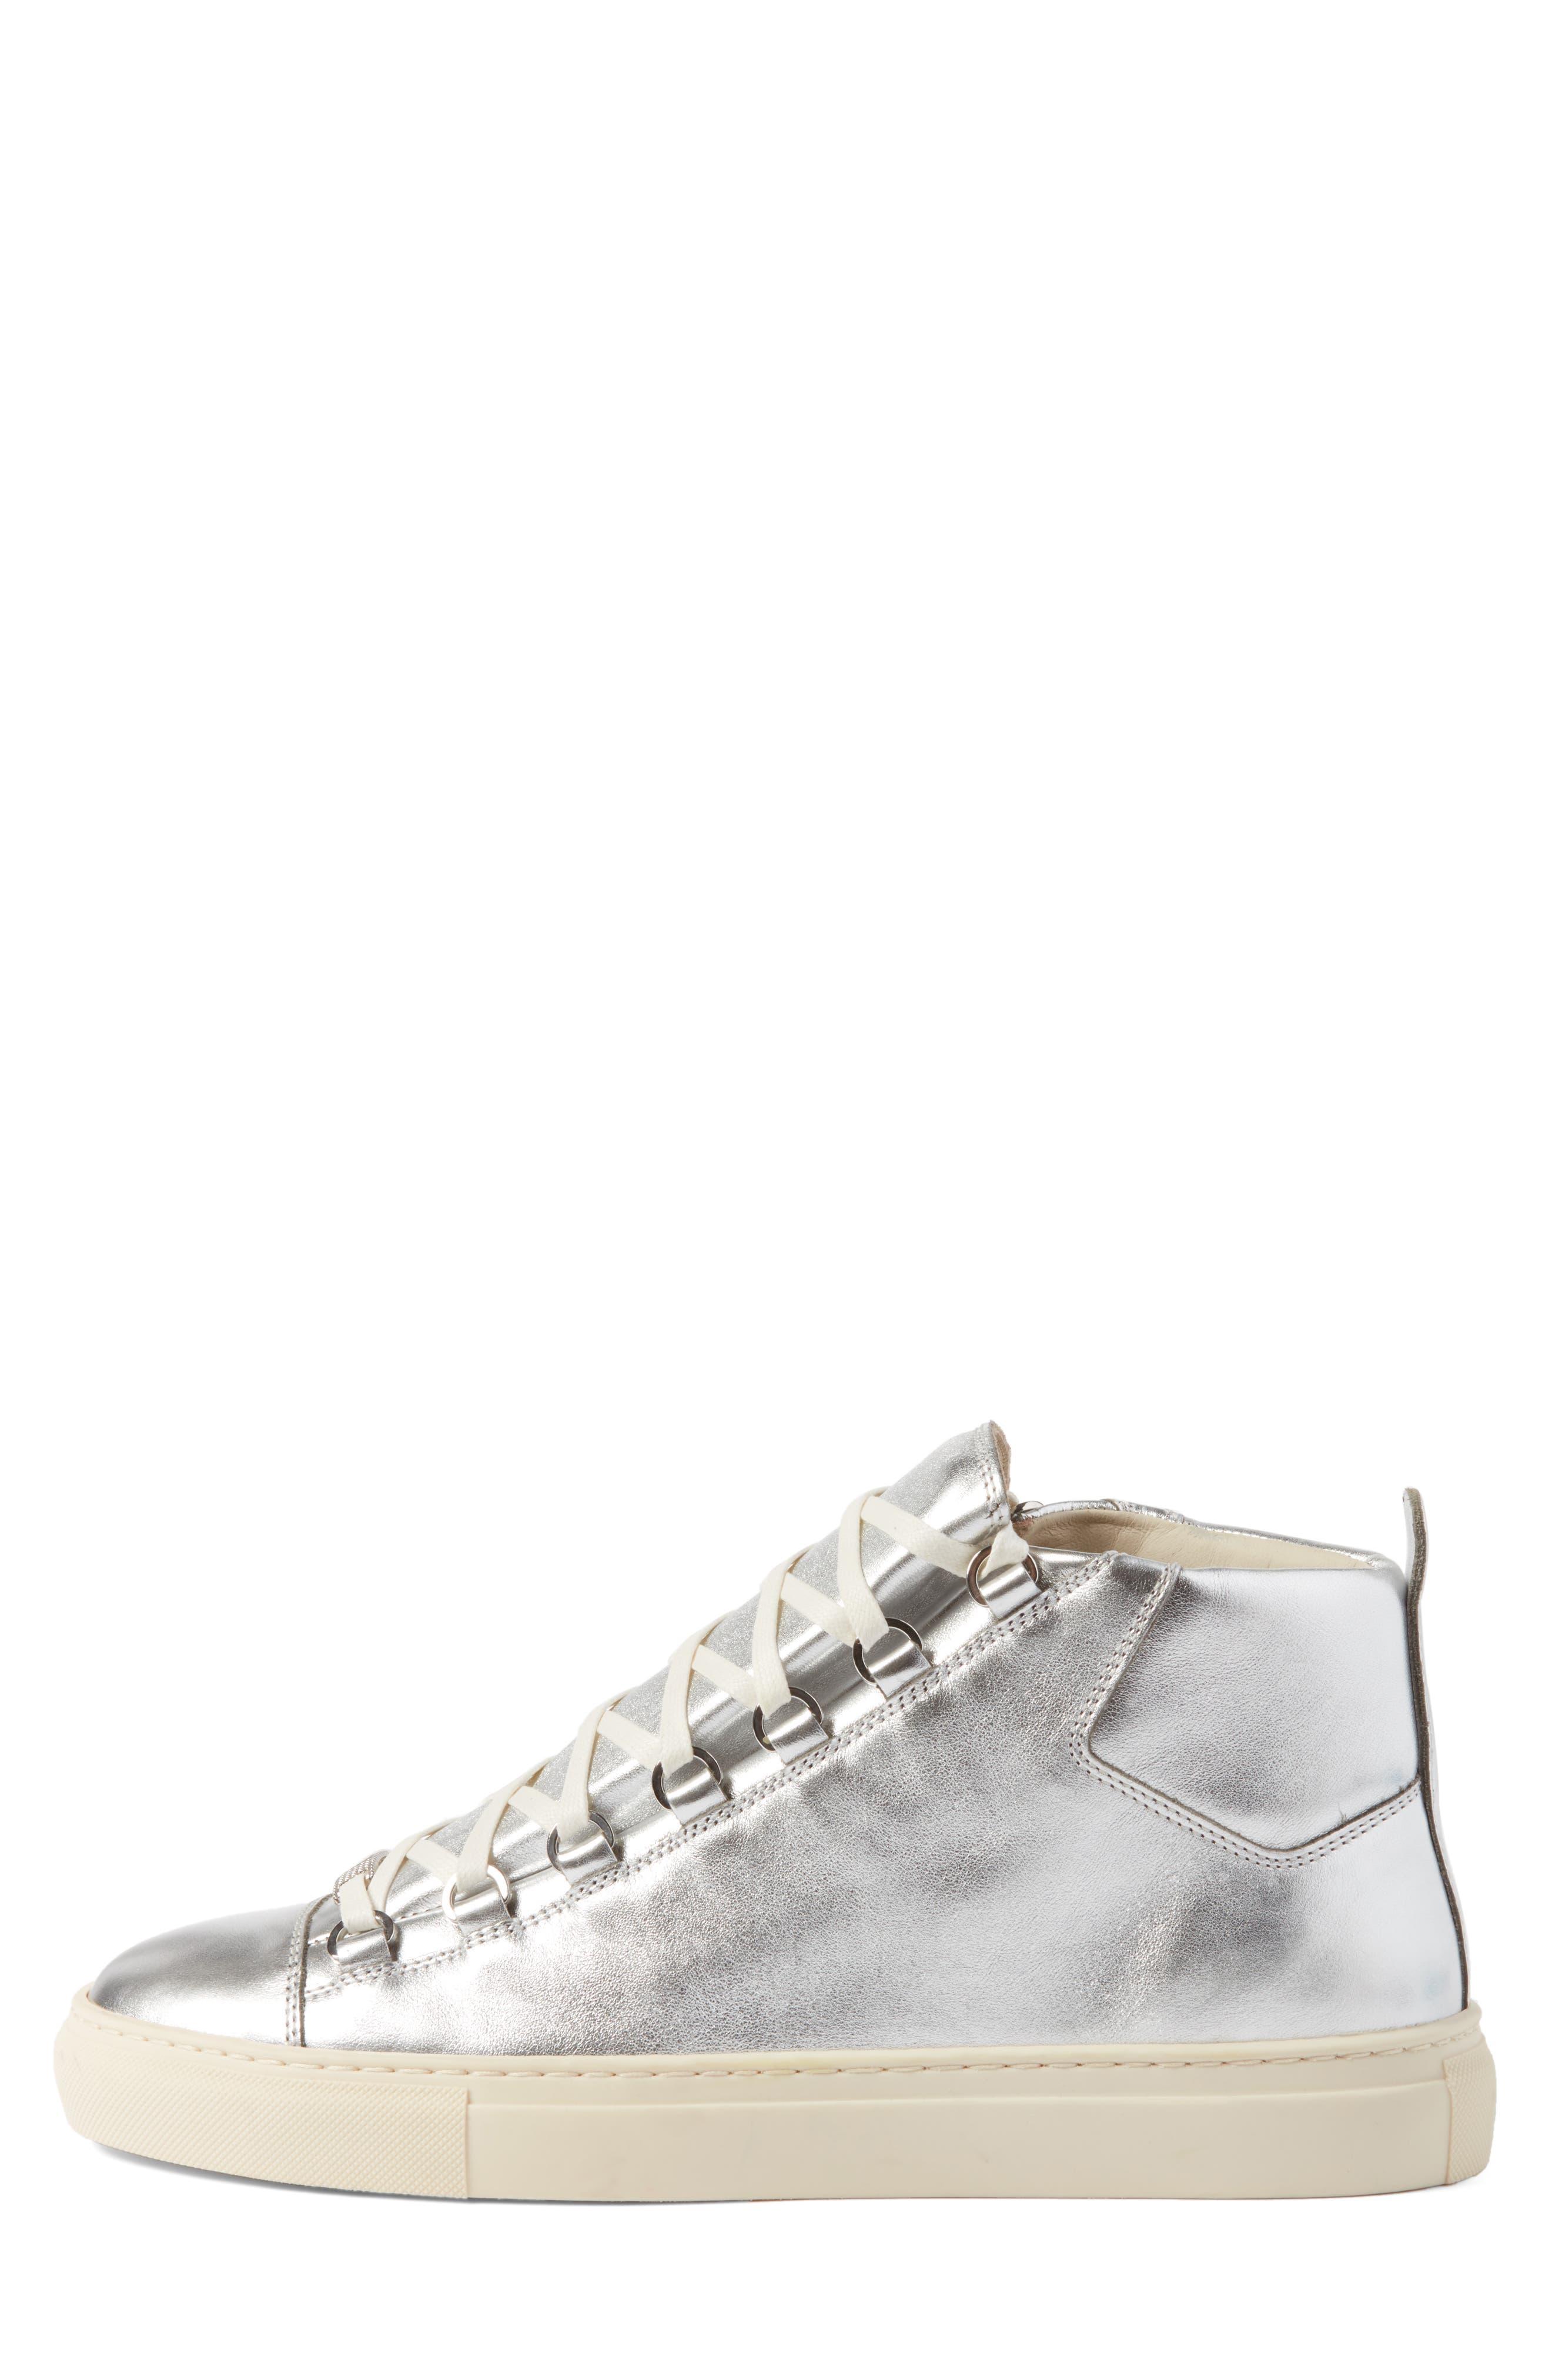 Arena High Sneaker,                             Alternate thumbnail 21, color,